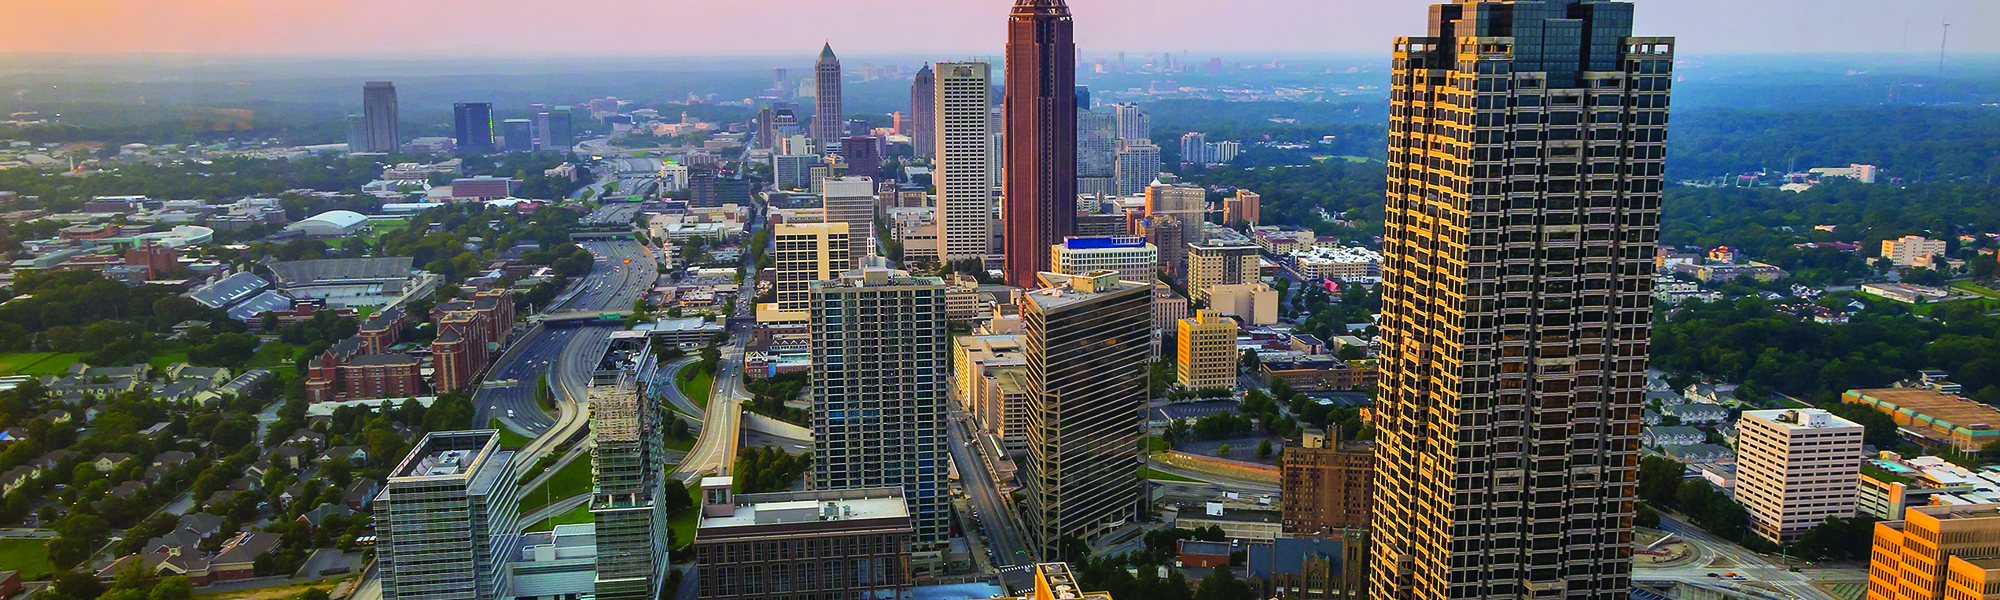 Atlanta, Georgia.jpg